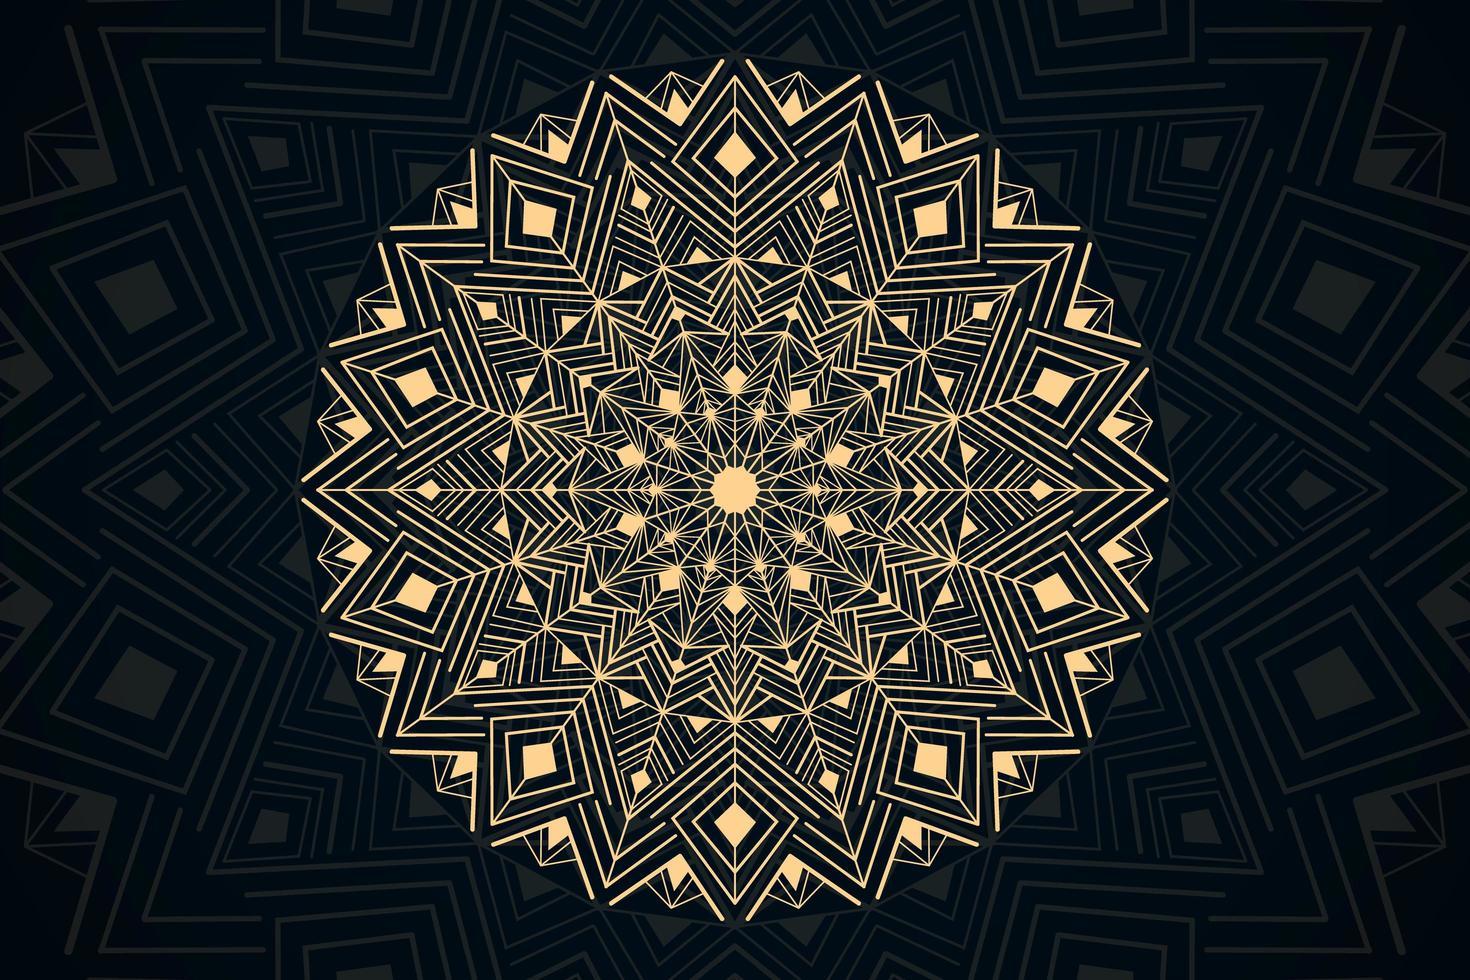 Tapete mit goldenem Luxus-Mandala-Thema vektor